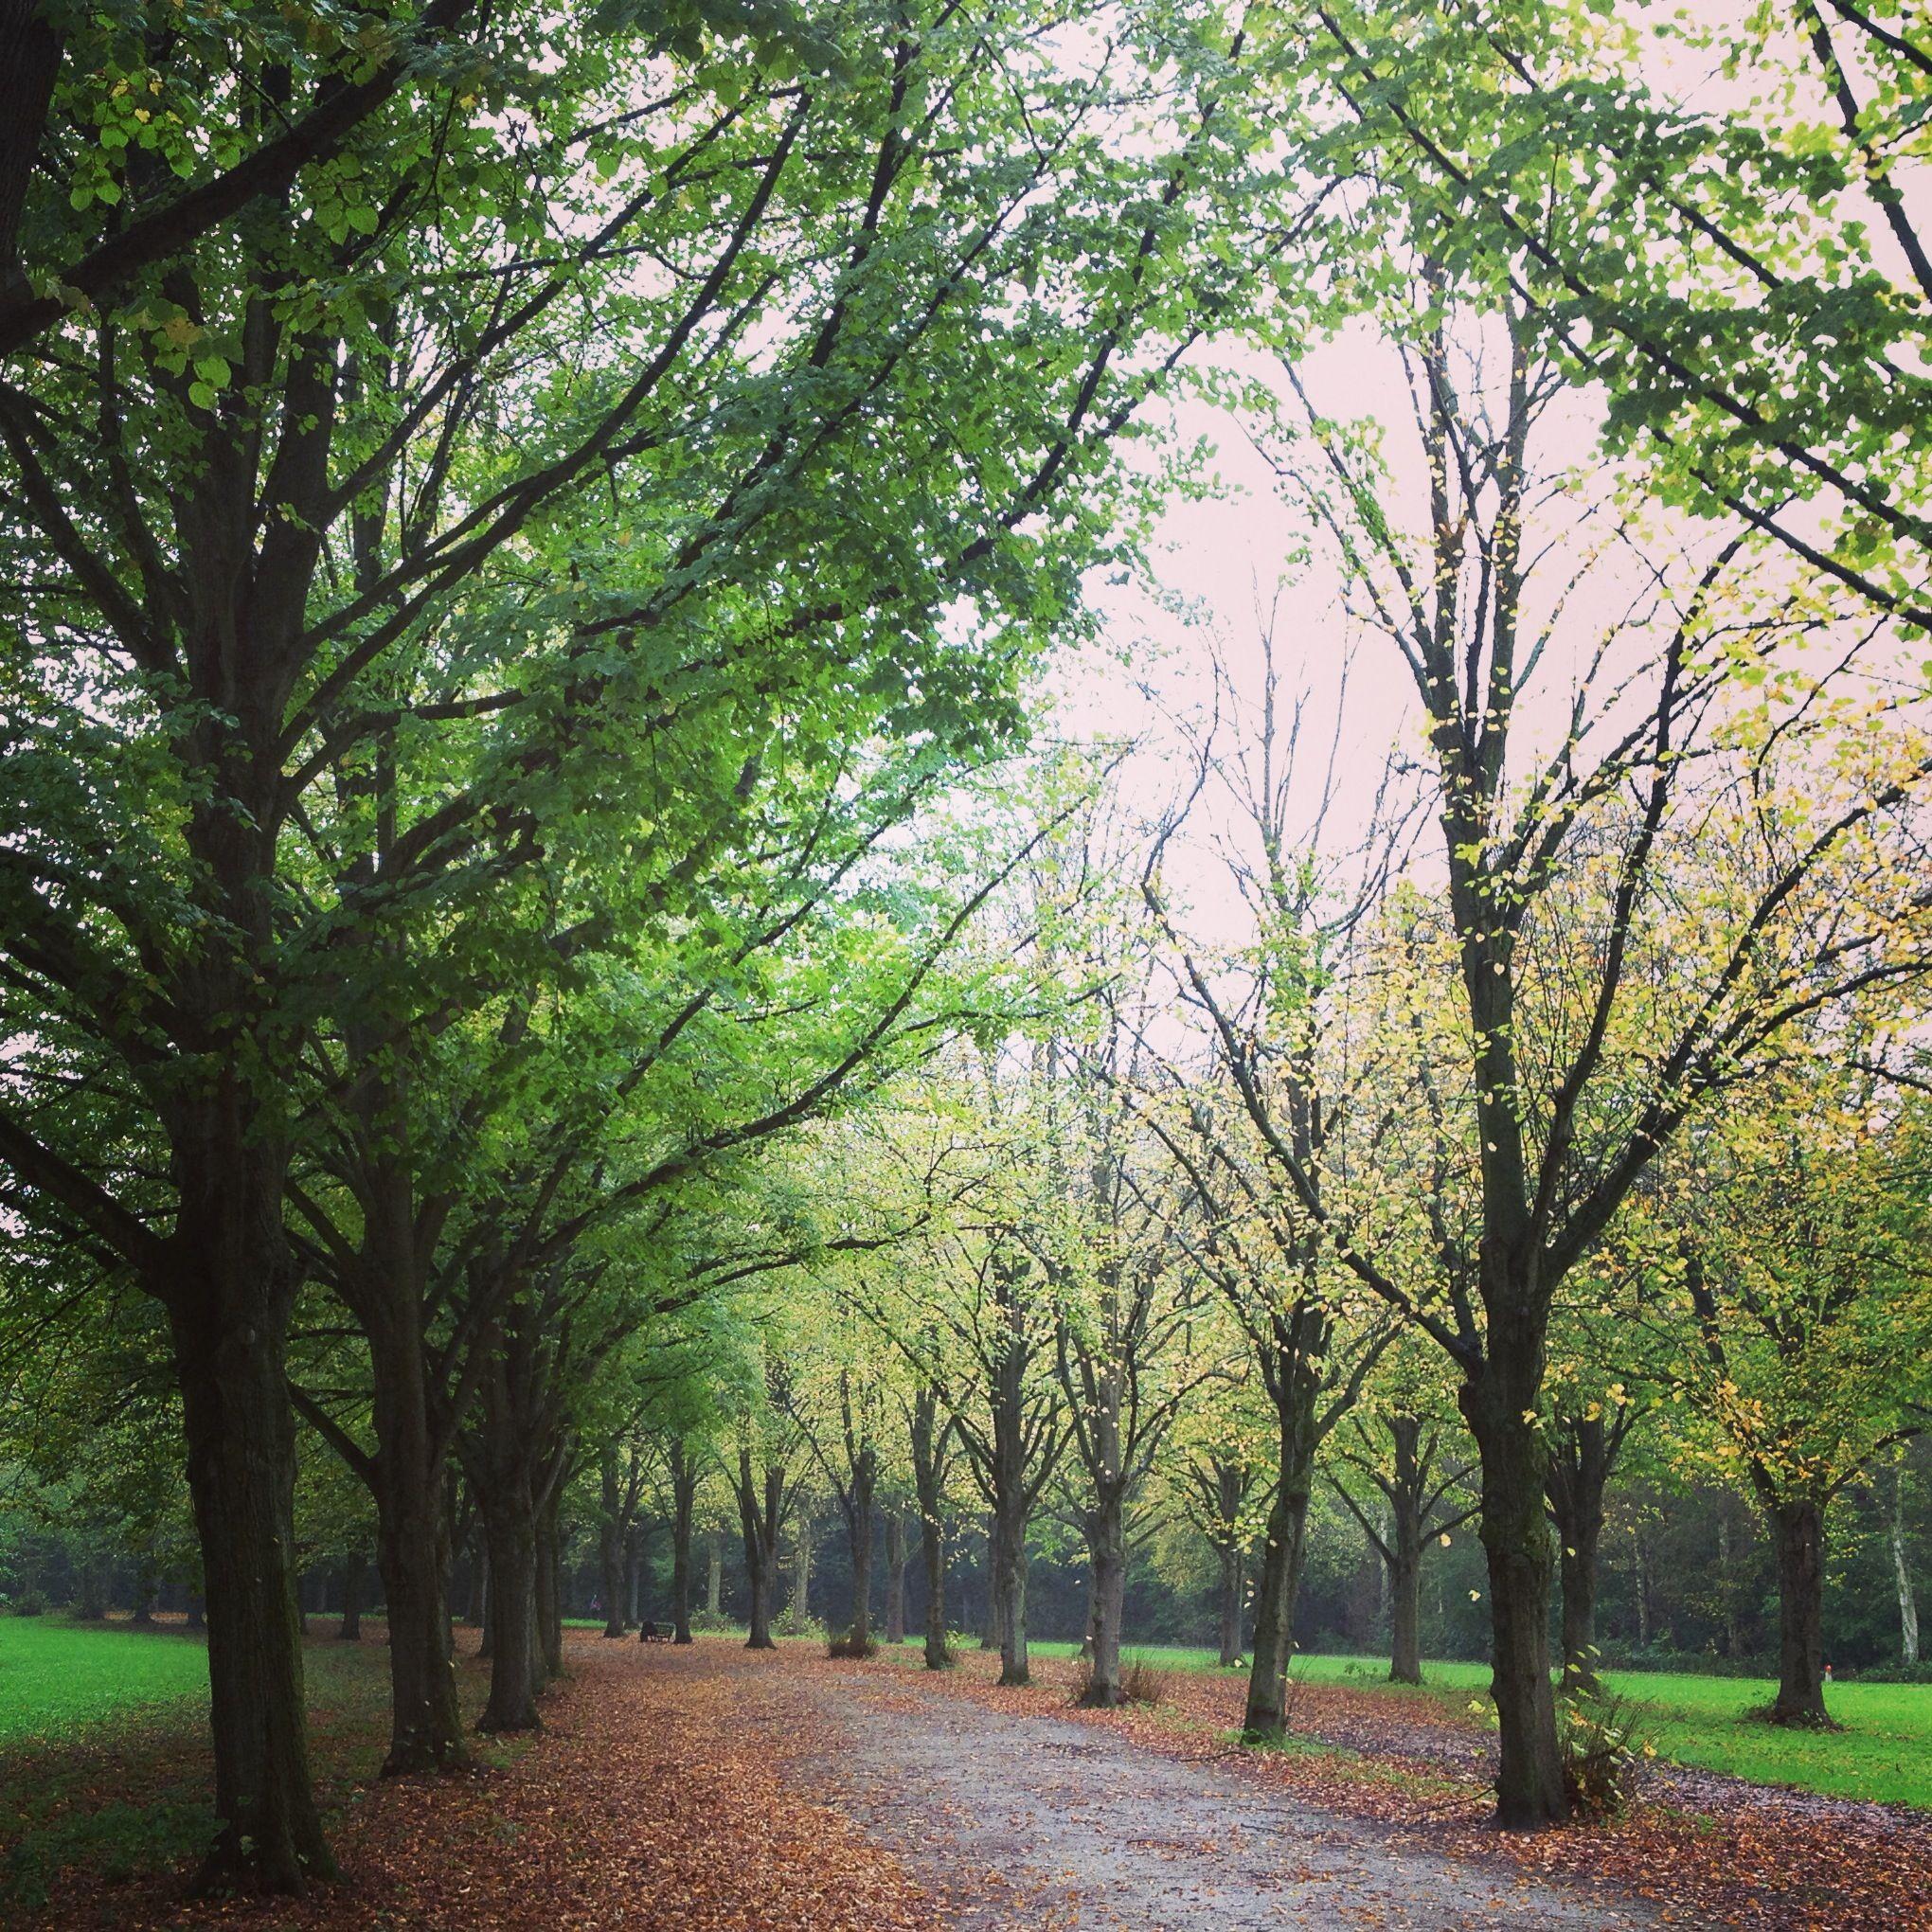 Amsterdamse bos oktober 2014